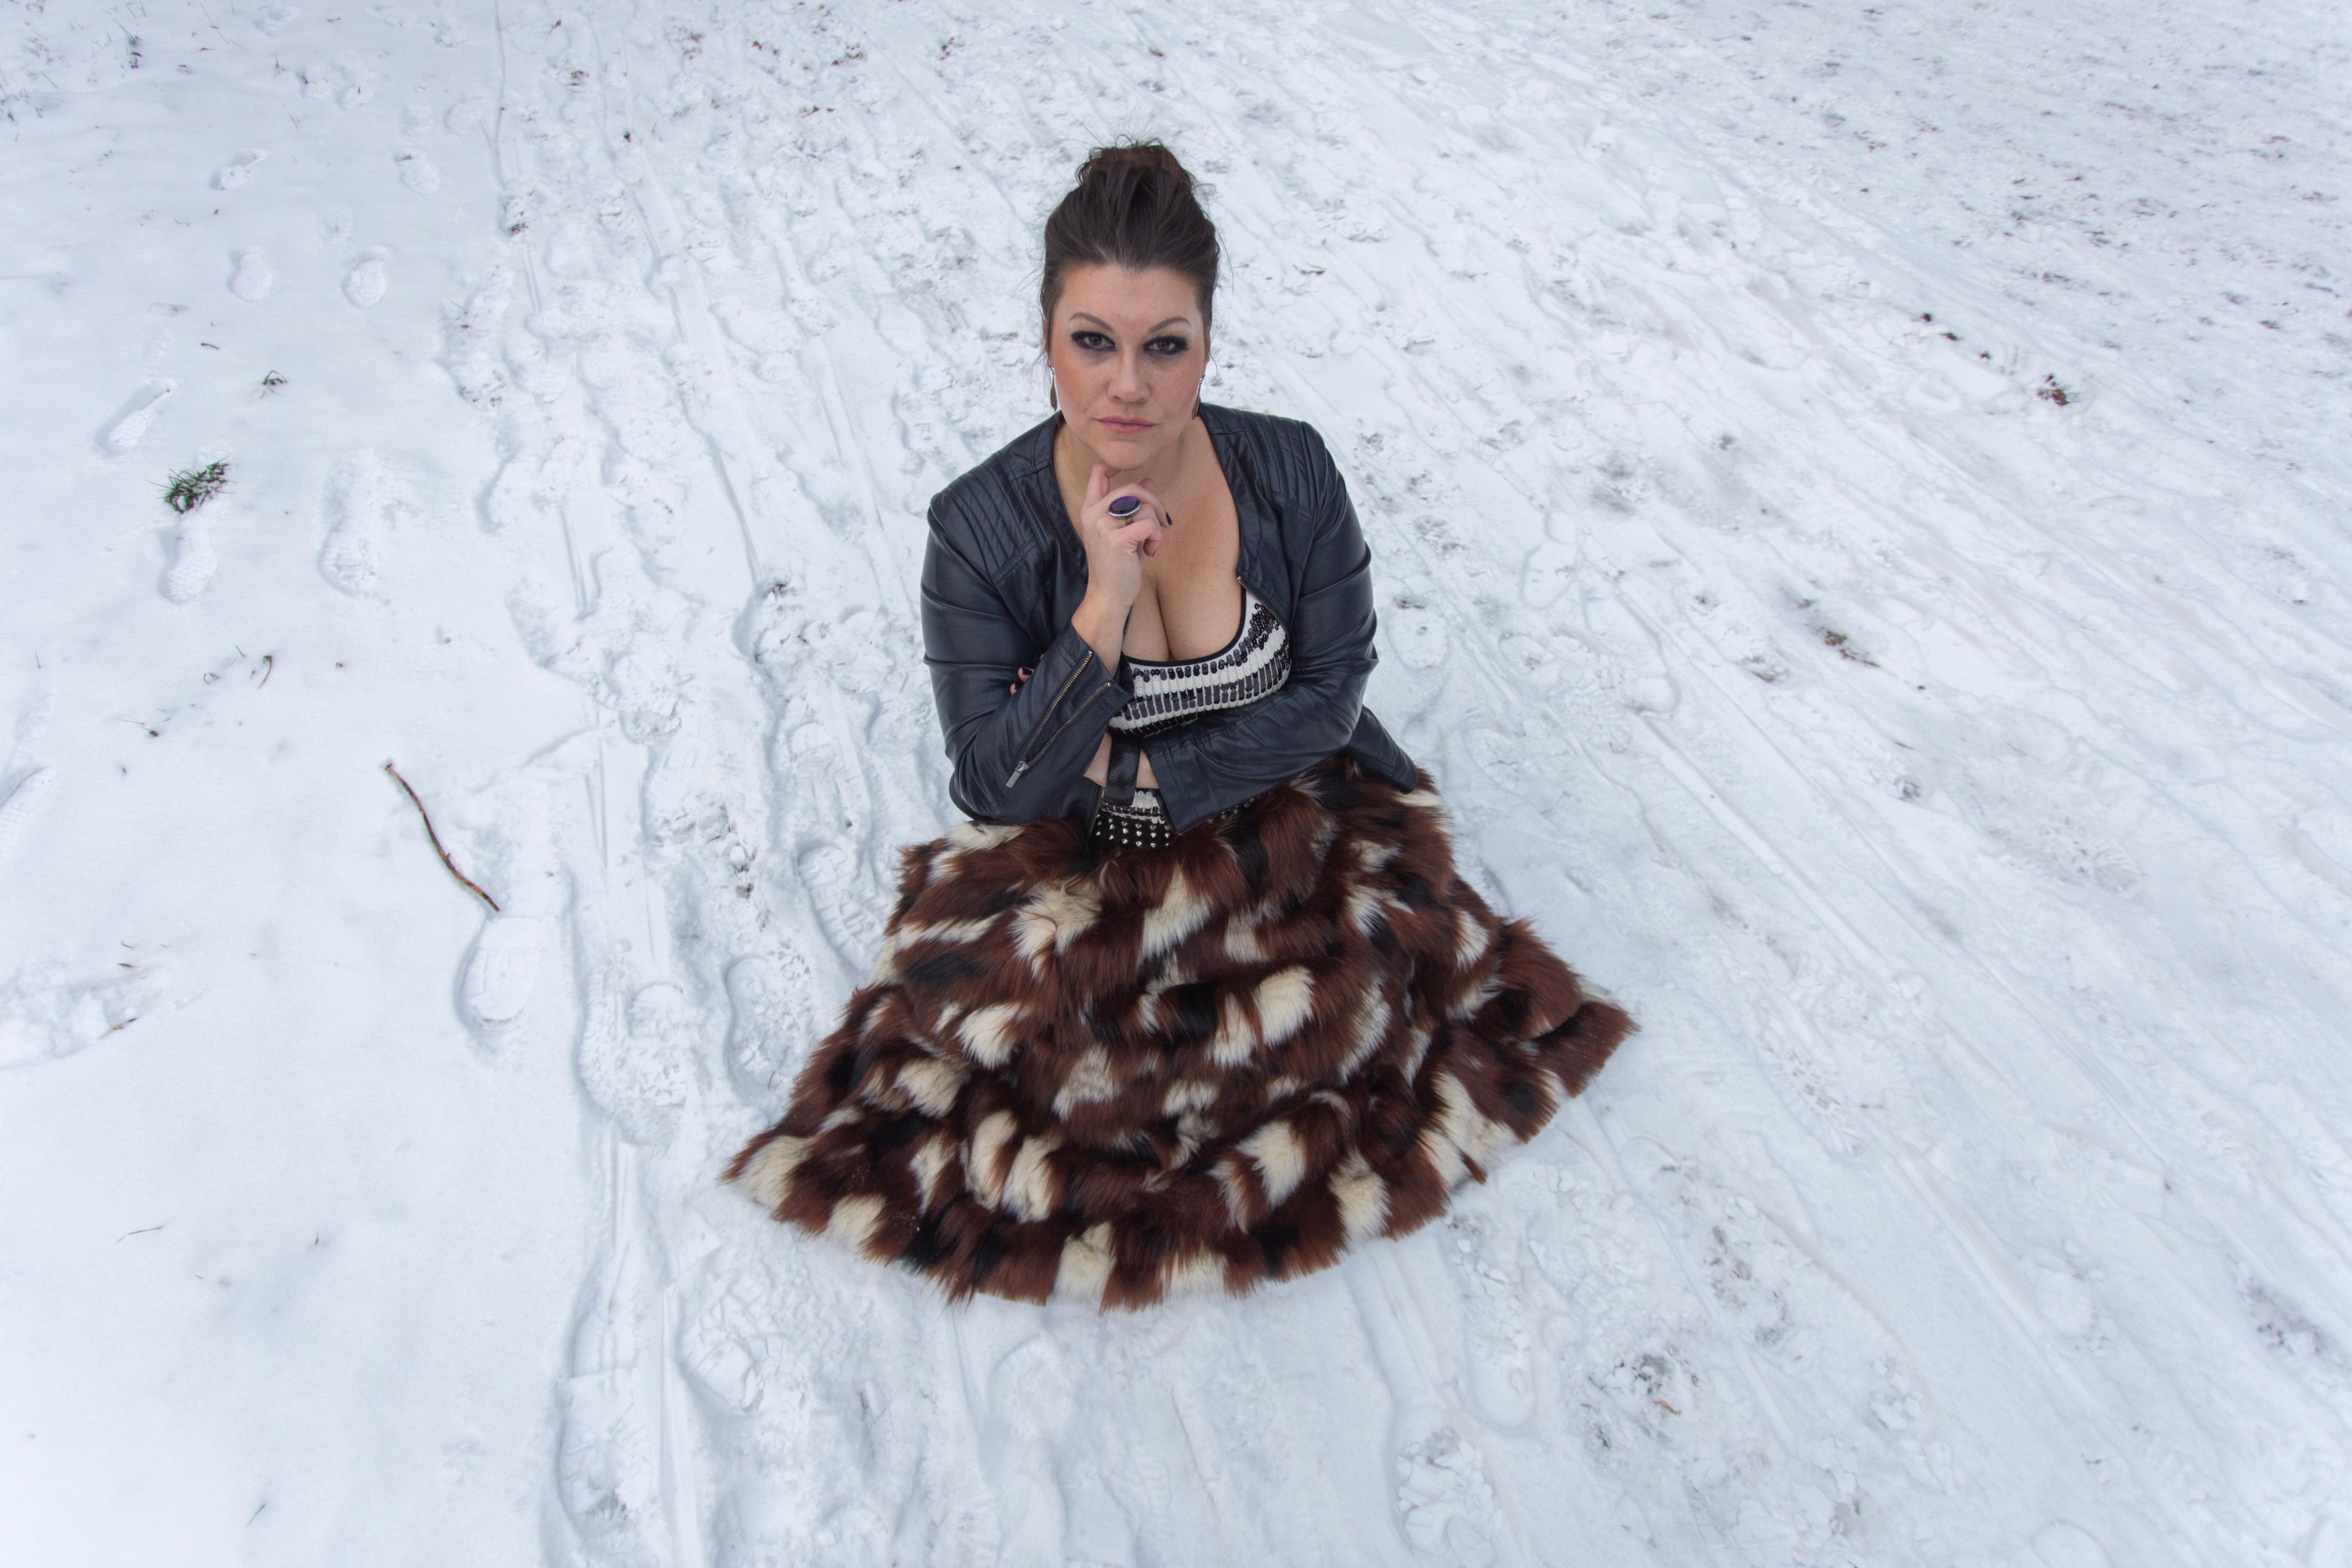 madonna blogger award navabi fauxfur plussize fashion devil queen outfit look pelz fakefur snowwhite kardiaserena (2)